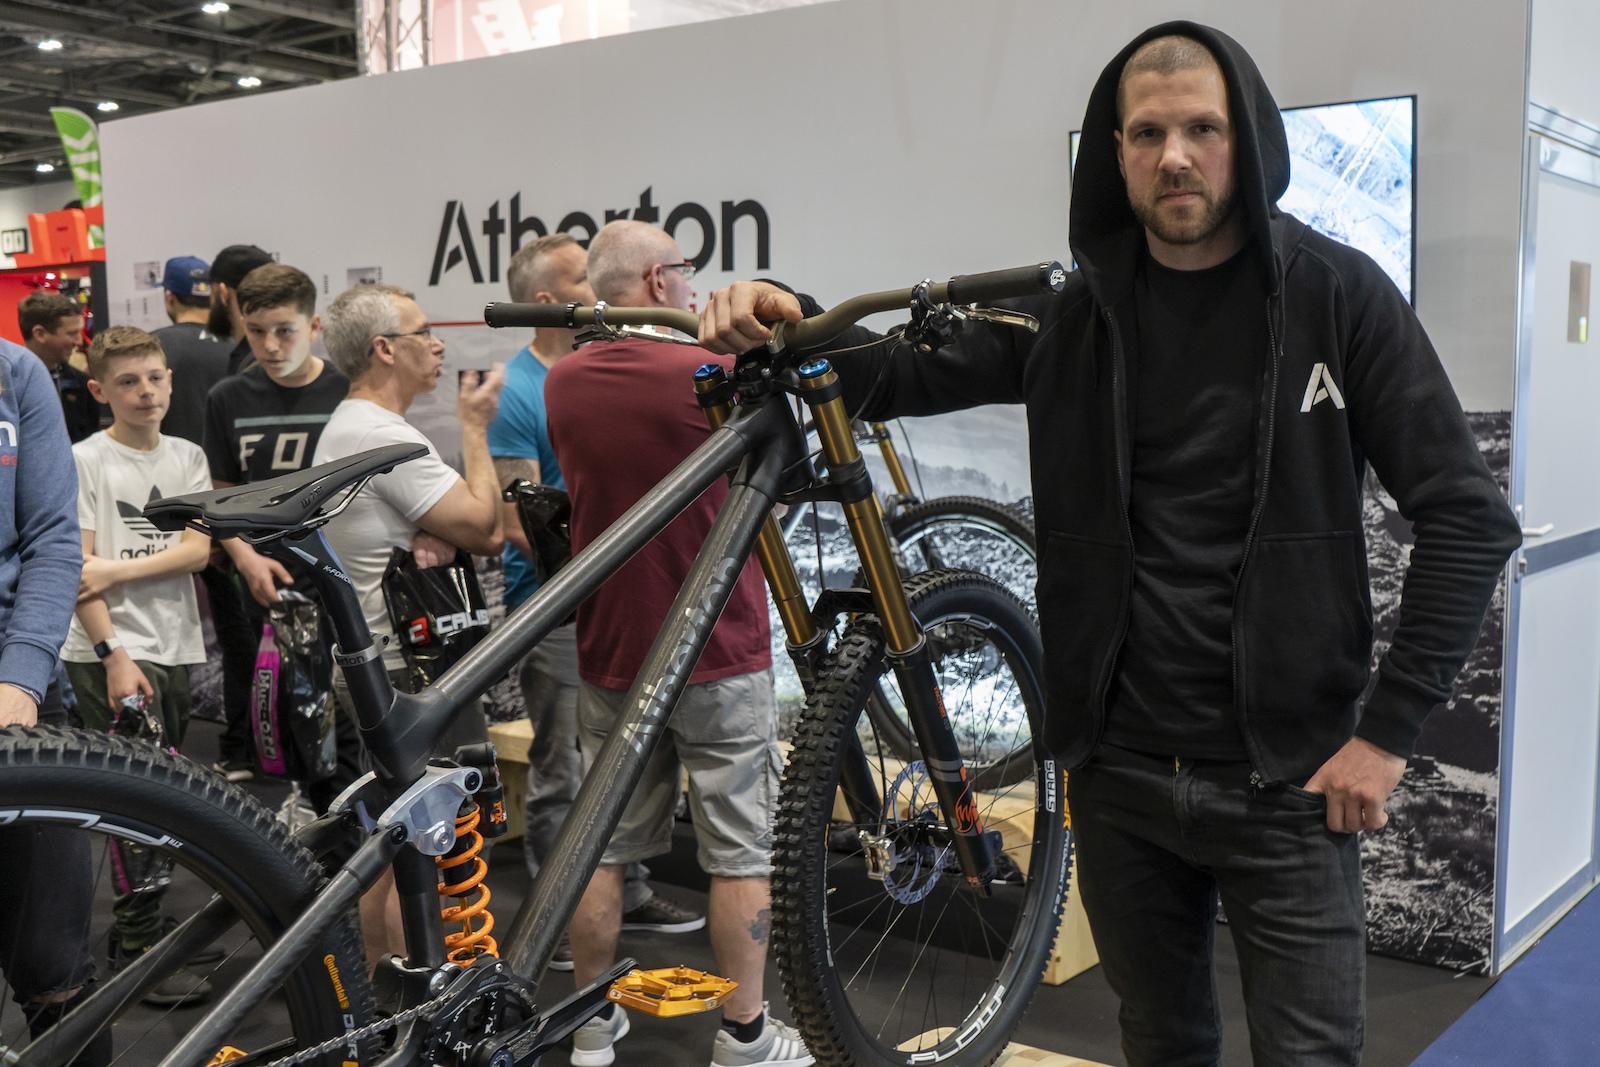 e03d32d7278 Bike Check: Dan Atherton's Prototype 29er DH Bike - Pinkbike